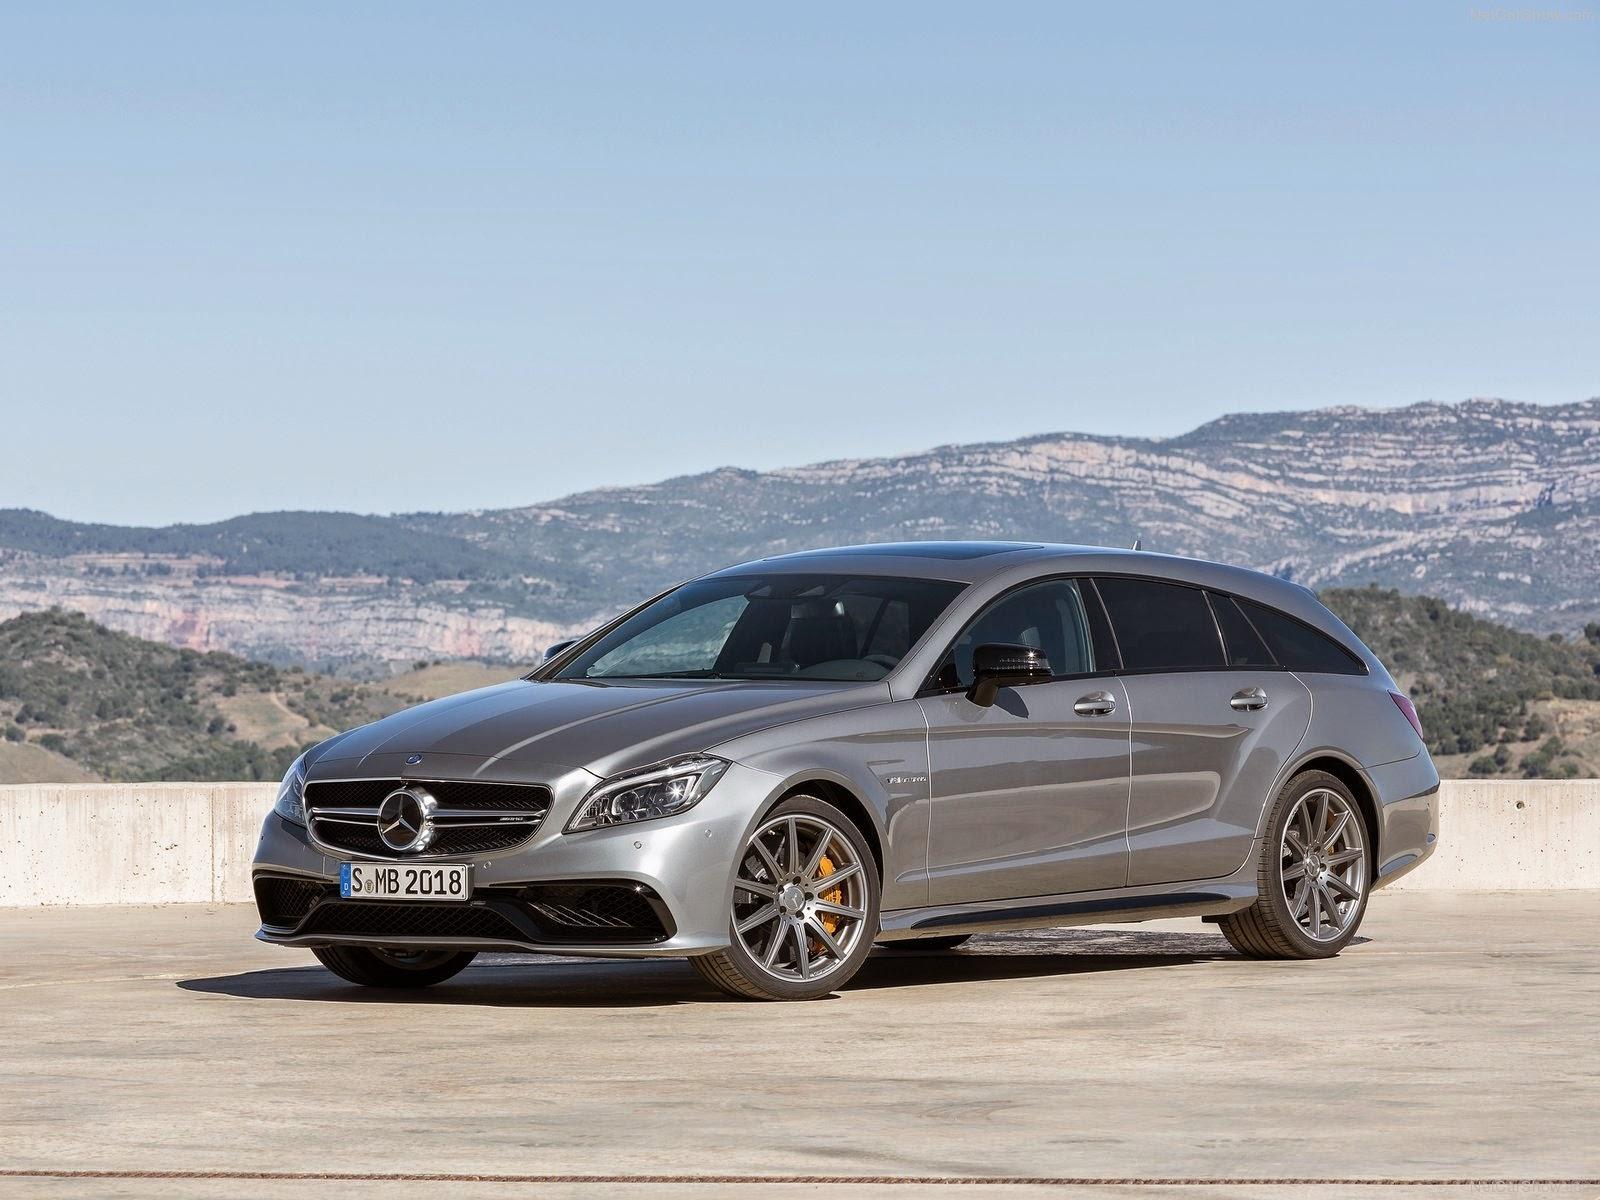 Mercedes-Benz-CLS63_AMG_Shooting_Brake_2015_1600x1200_wallpaper_05.jpg